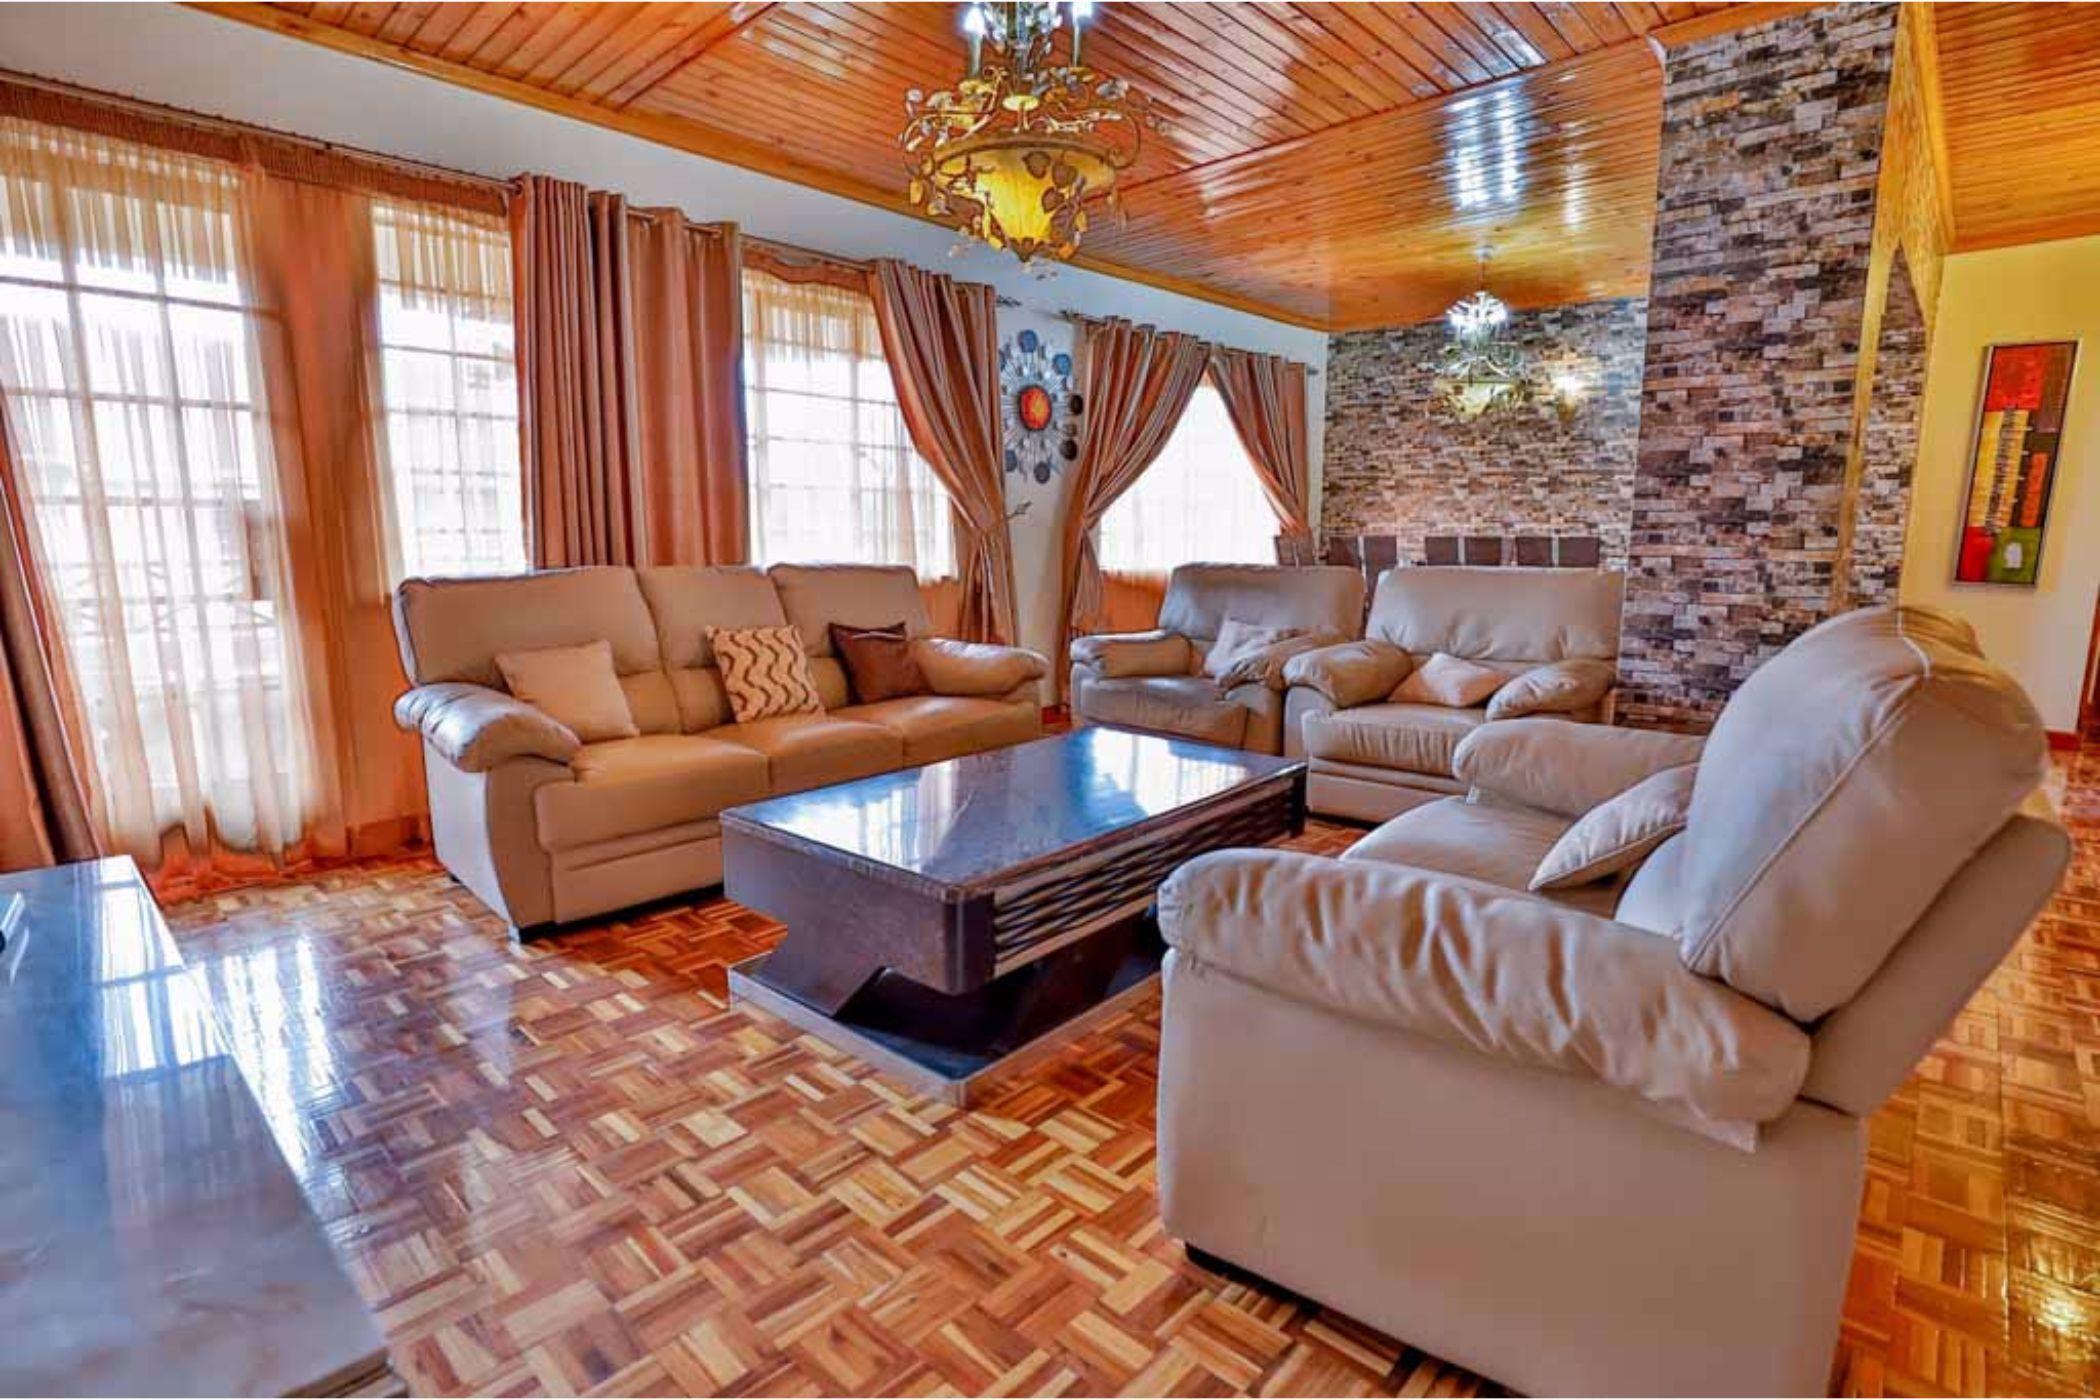 3 bedroom apartment to rent in Lavington (Kenya)